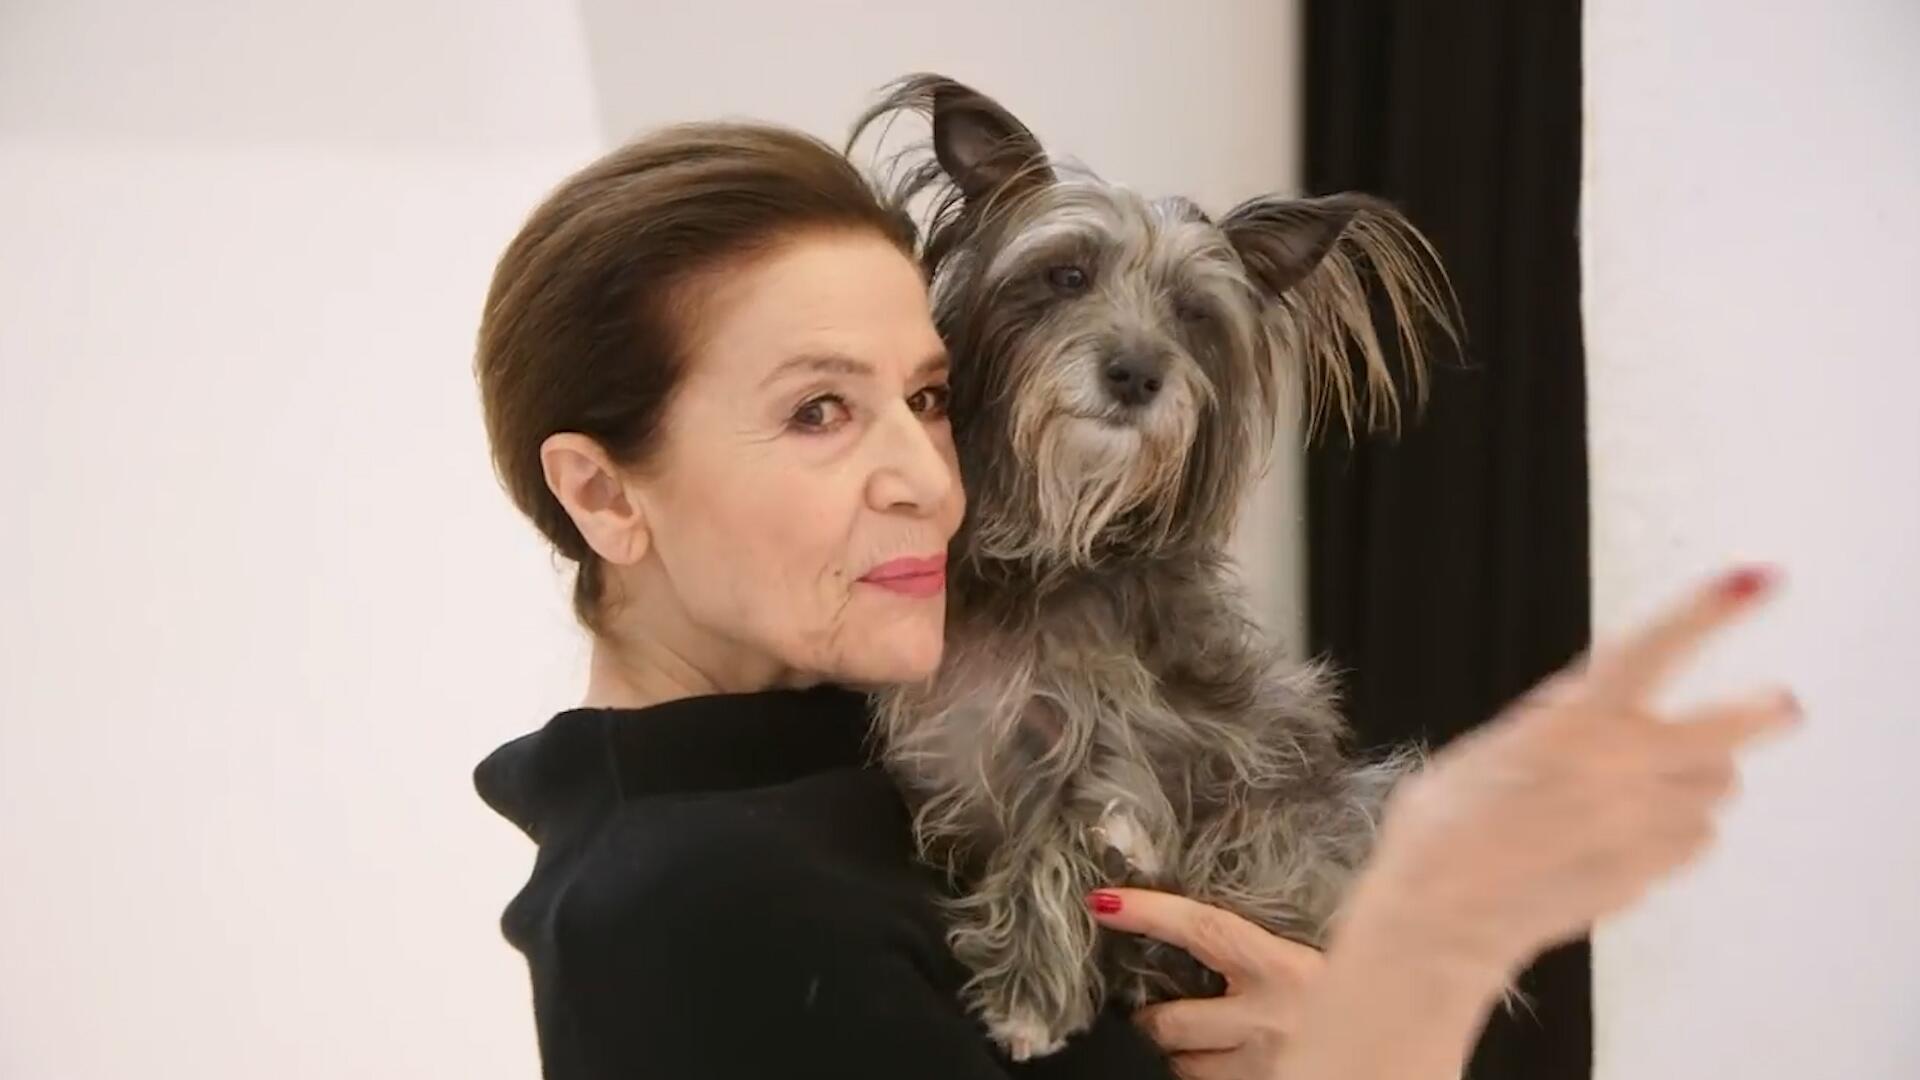 Bild zu Hannelore Elsner für Peta: So trägt man Pelz!